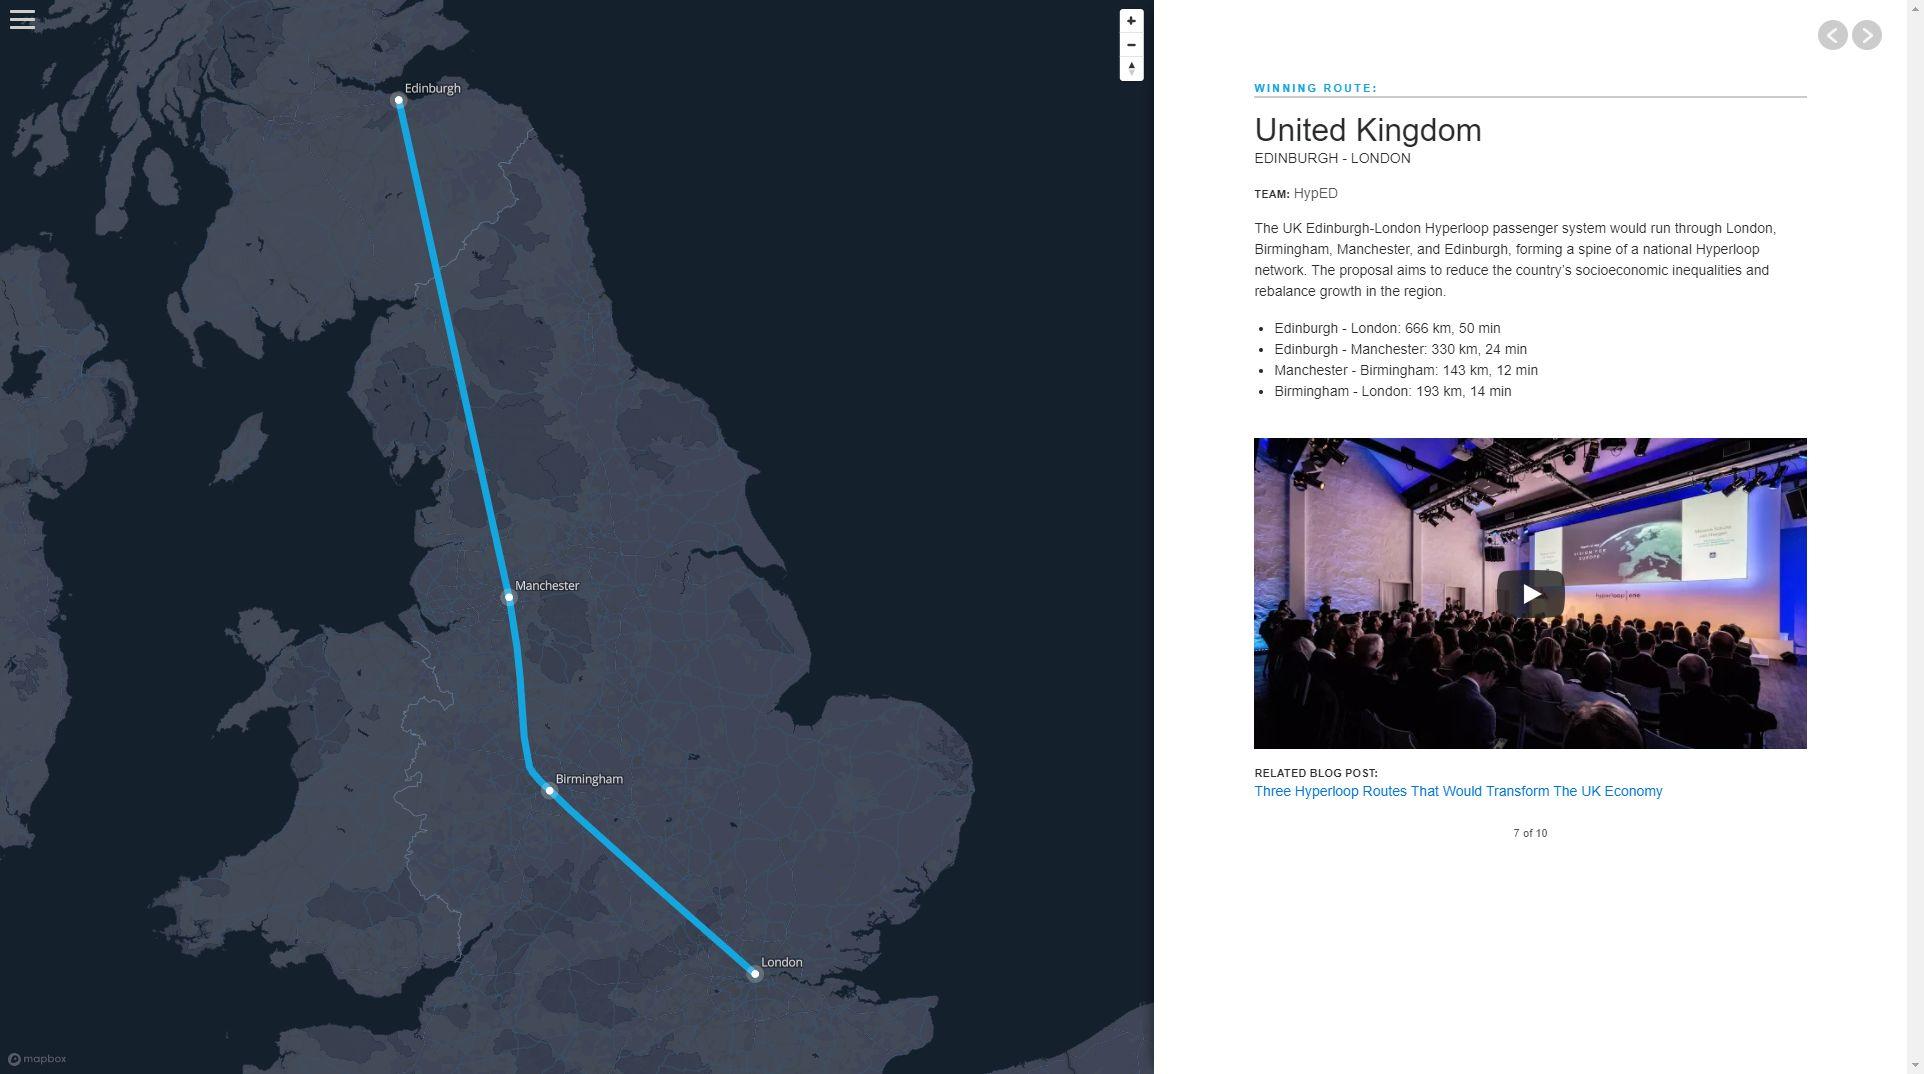 London-Manchester-Edinburgh on the Hyperloop